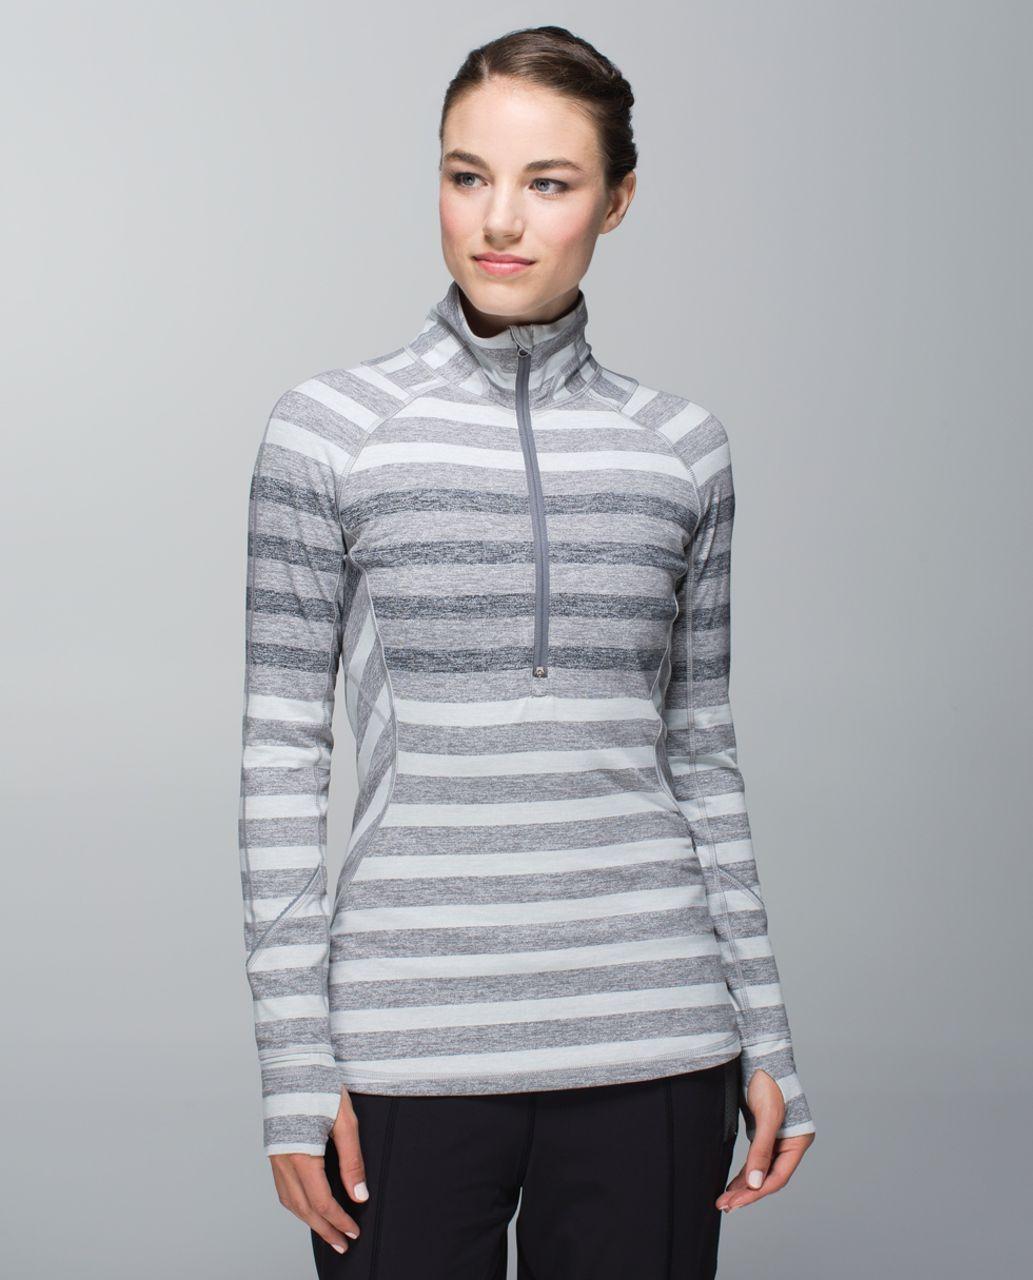 Lululemon Race Your Pace 1/2 Zip - Marshmallow Stripe Heathered Slate